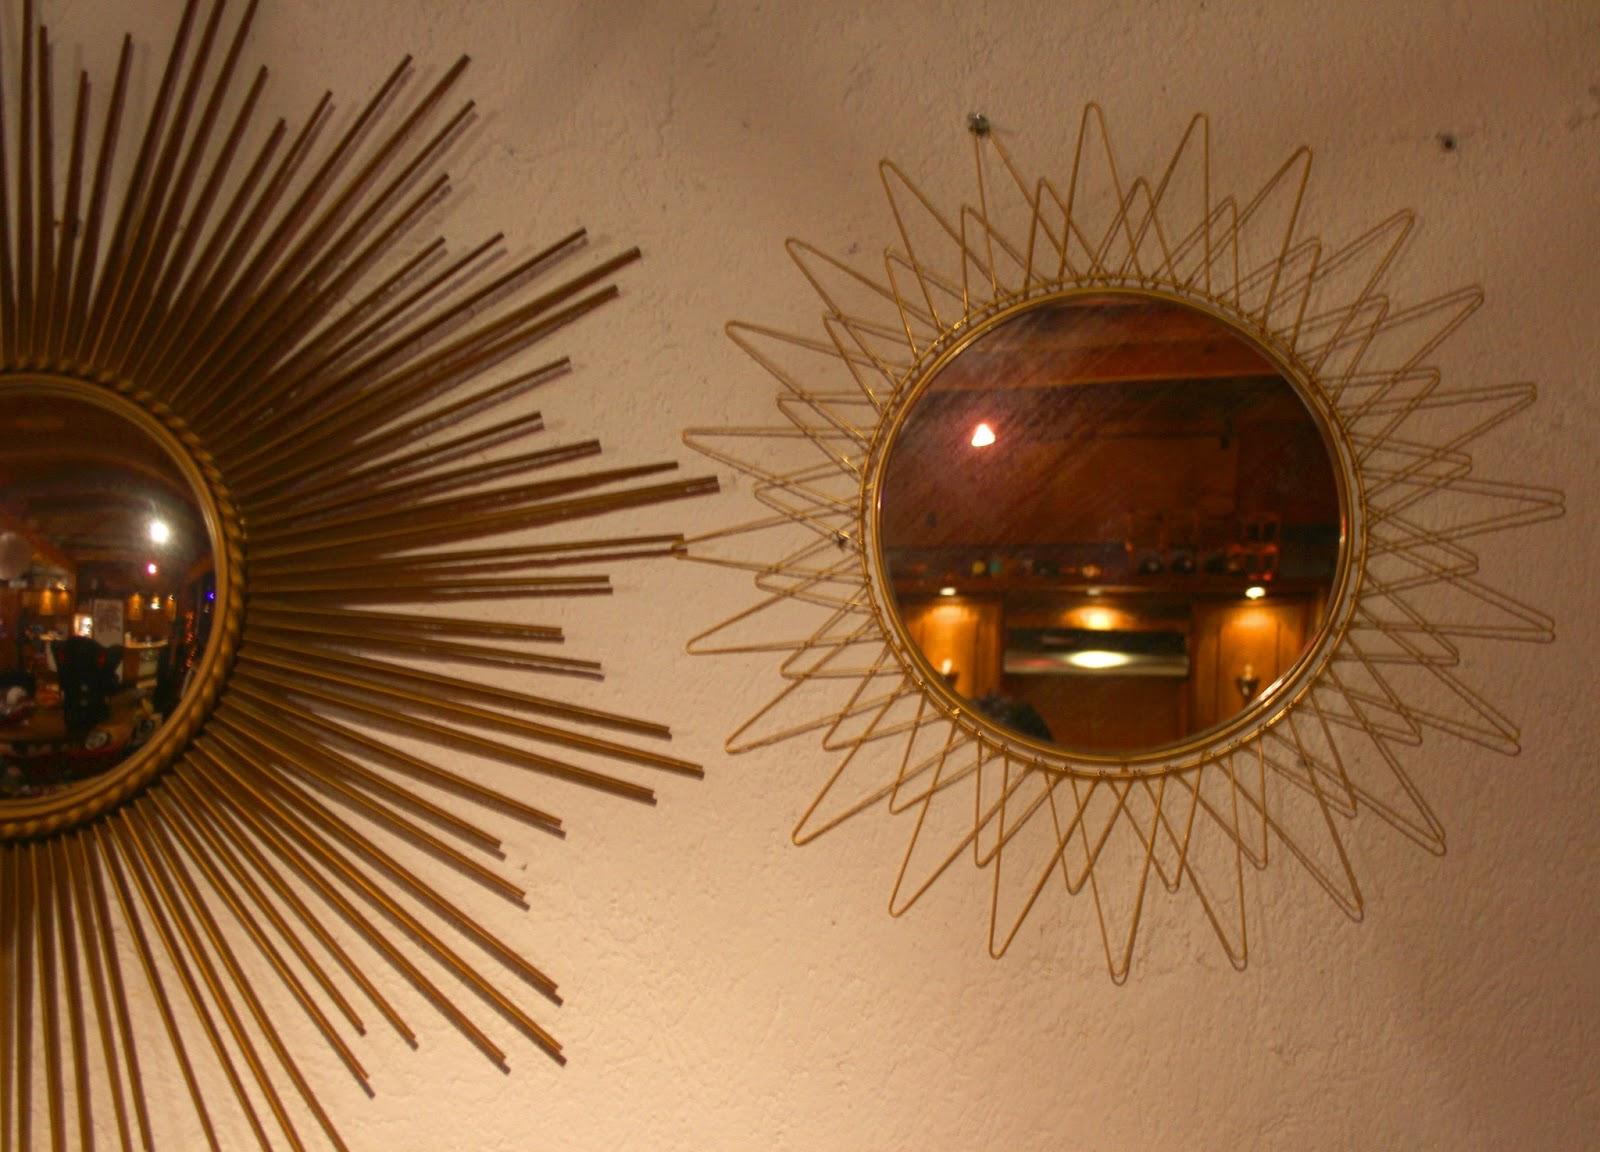 Chicbaazar objets vintage 50 60 70 miroir soleil rayons for Prix miroir 50 x 60